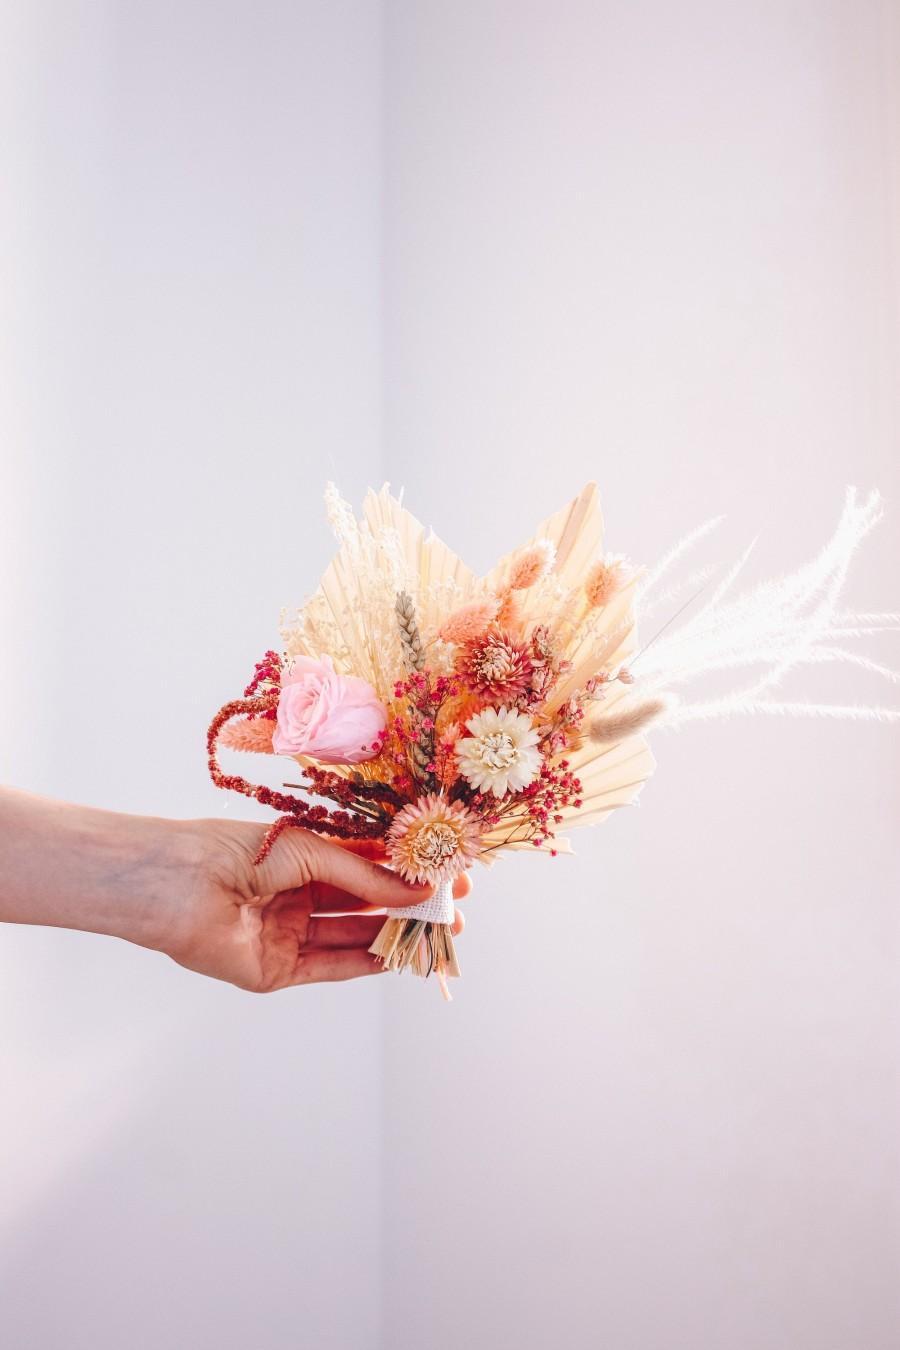 Hochzeit - Burgundy Pink Boho Palm Spear Bouquet / Dried Wildflower Bouquet / Preserved Rose Bouquet / Dancing Meadow Flowers